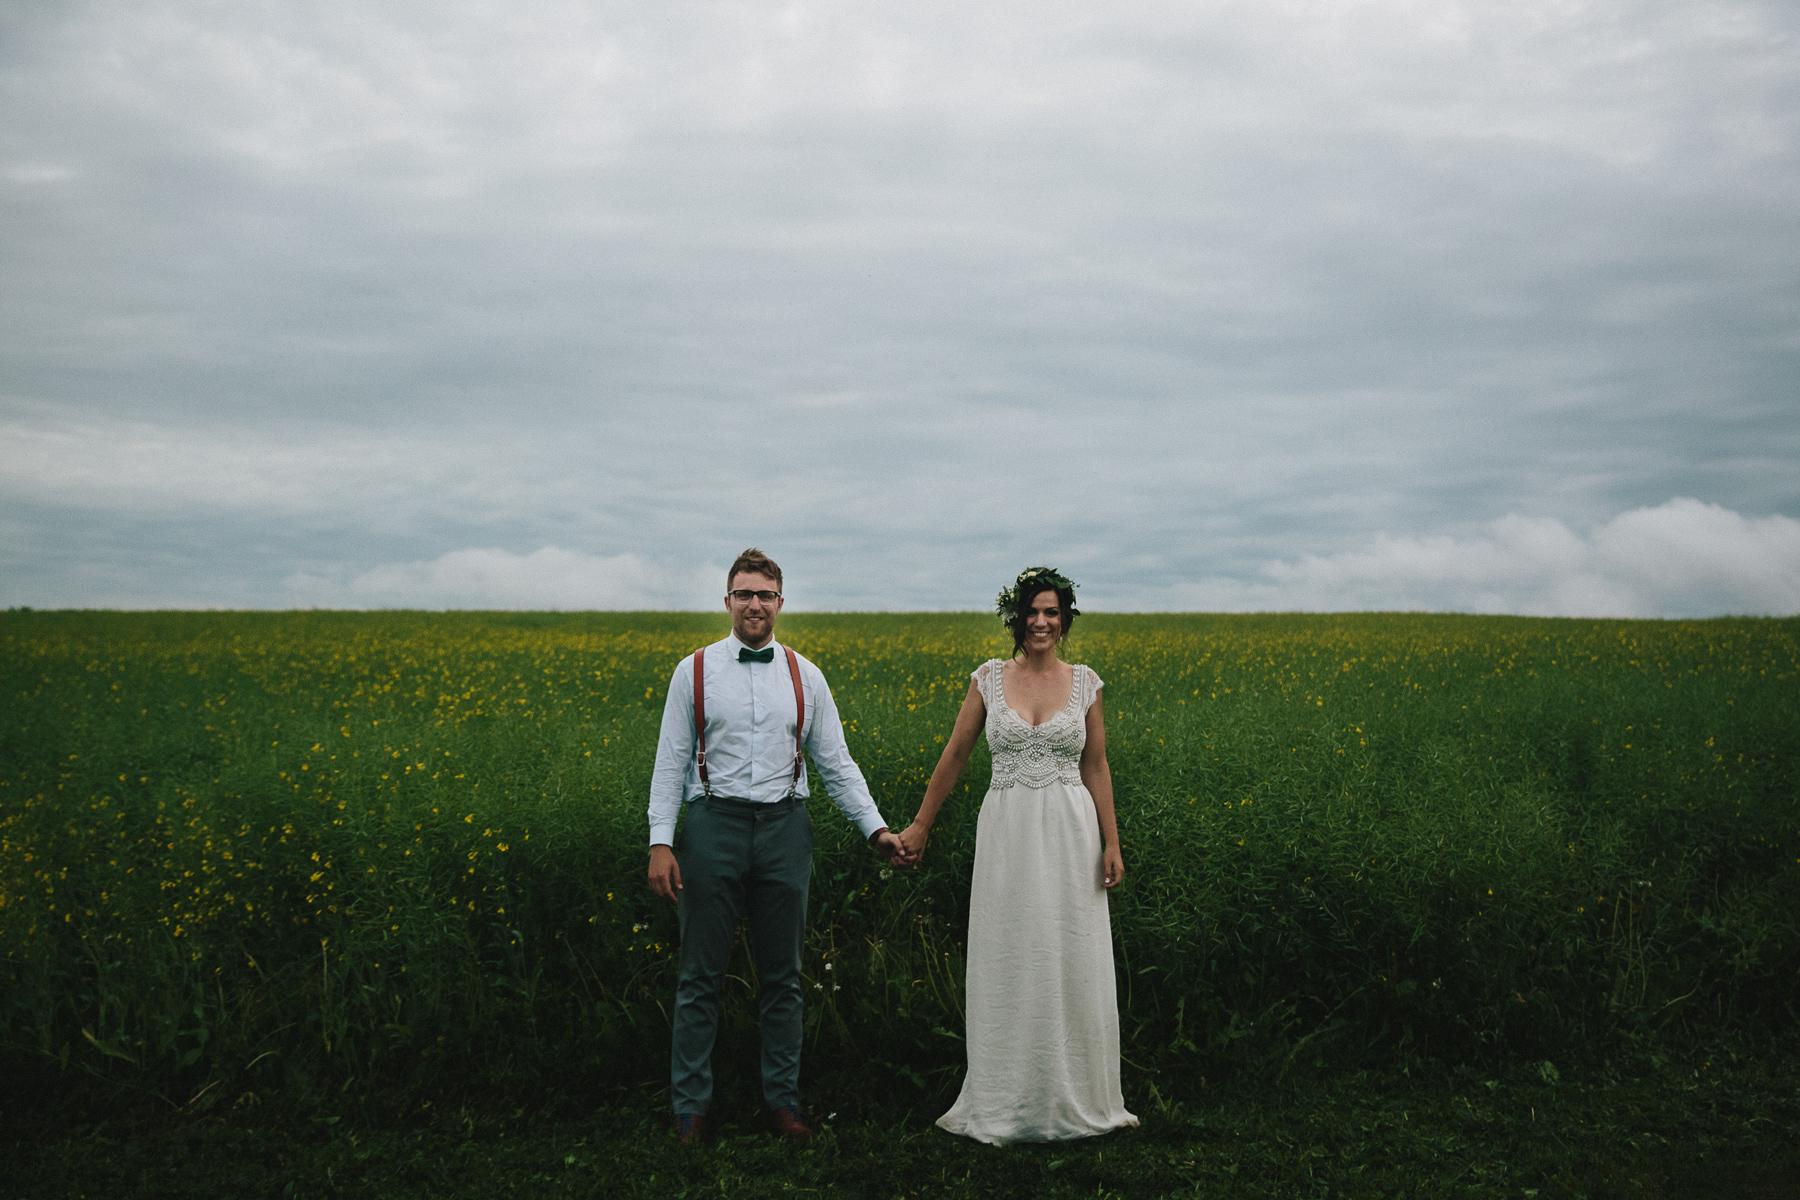 alberta-farm-wedding-photographer-rp-wj-227.jpg